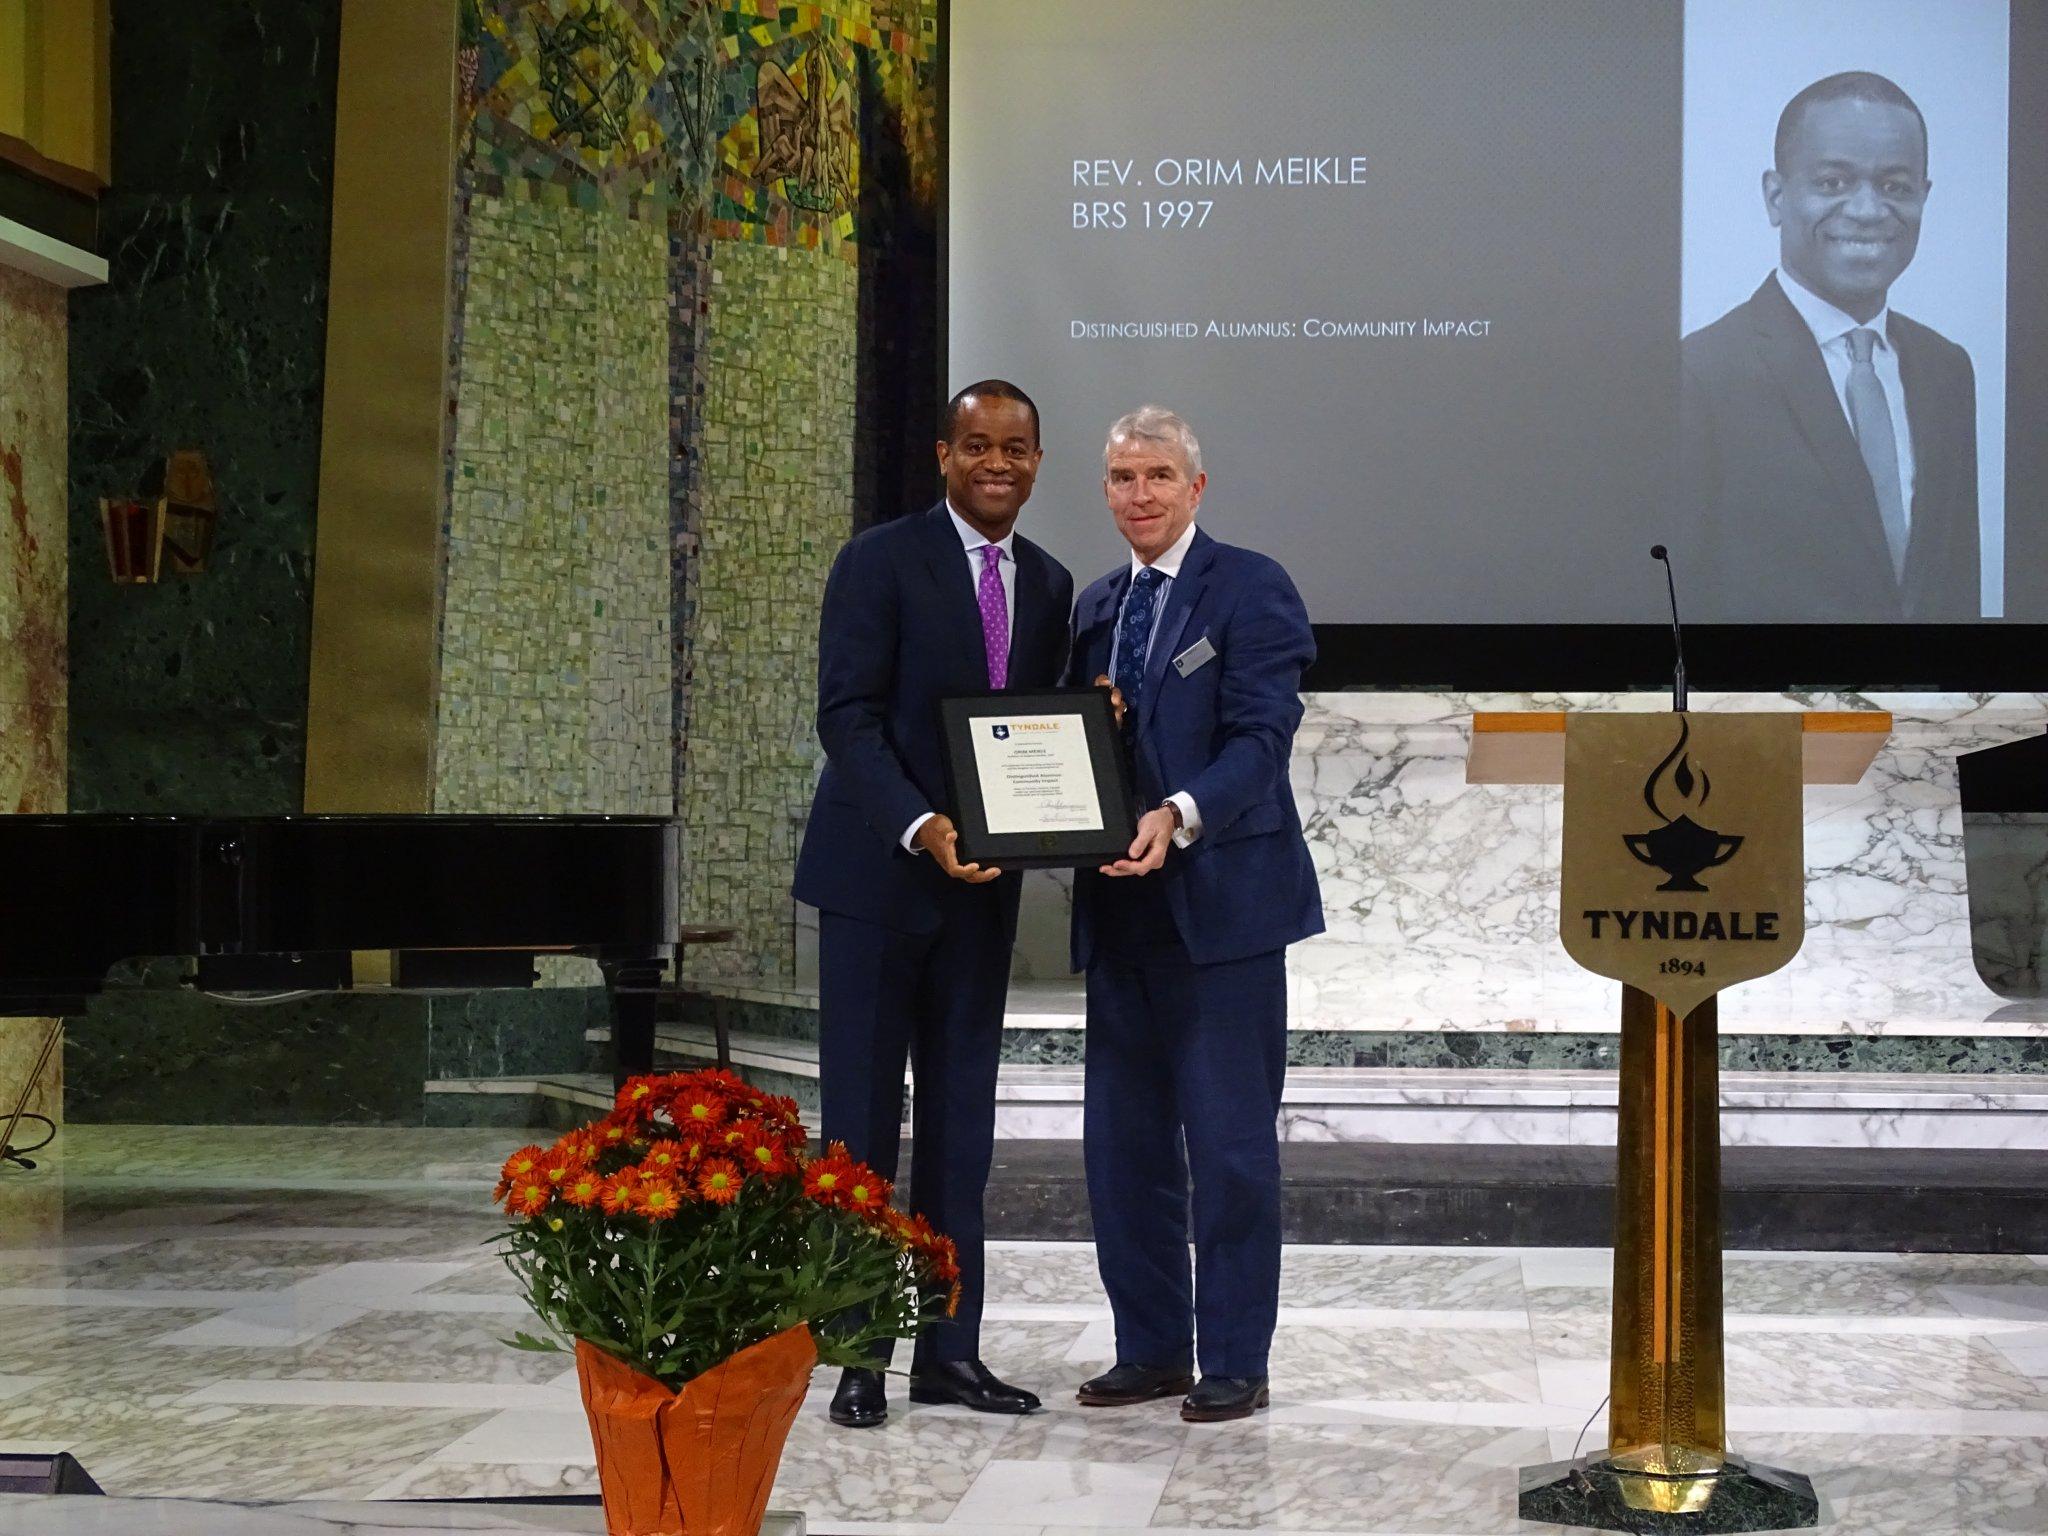 Distinguished Alumni: Rev. Orim Meikle